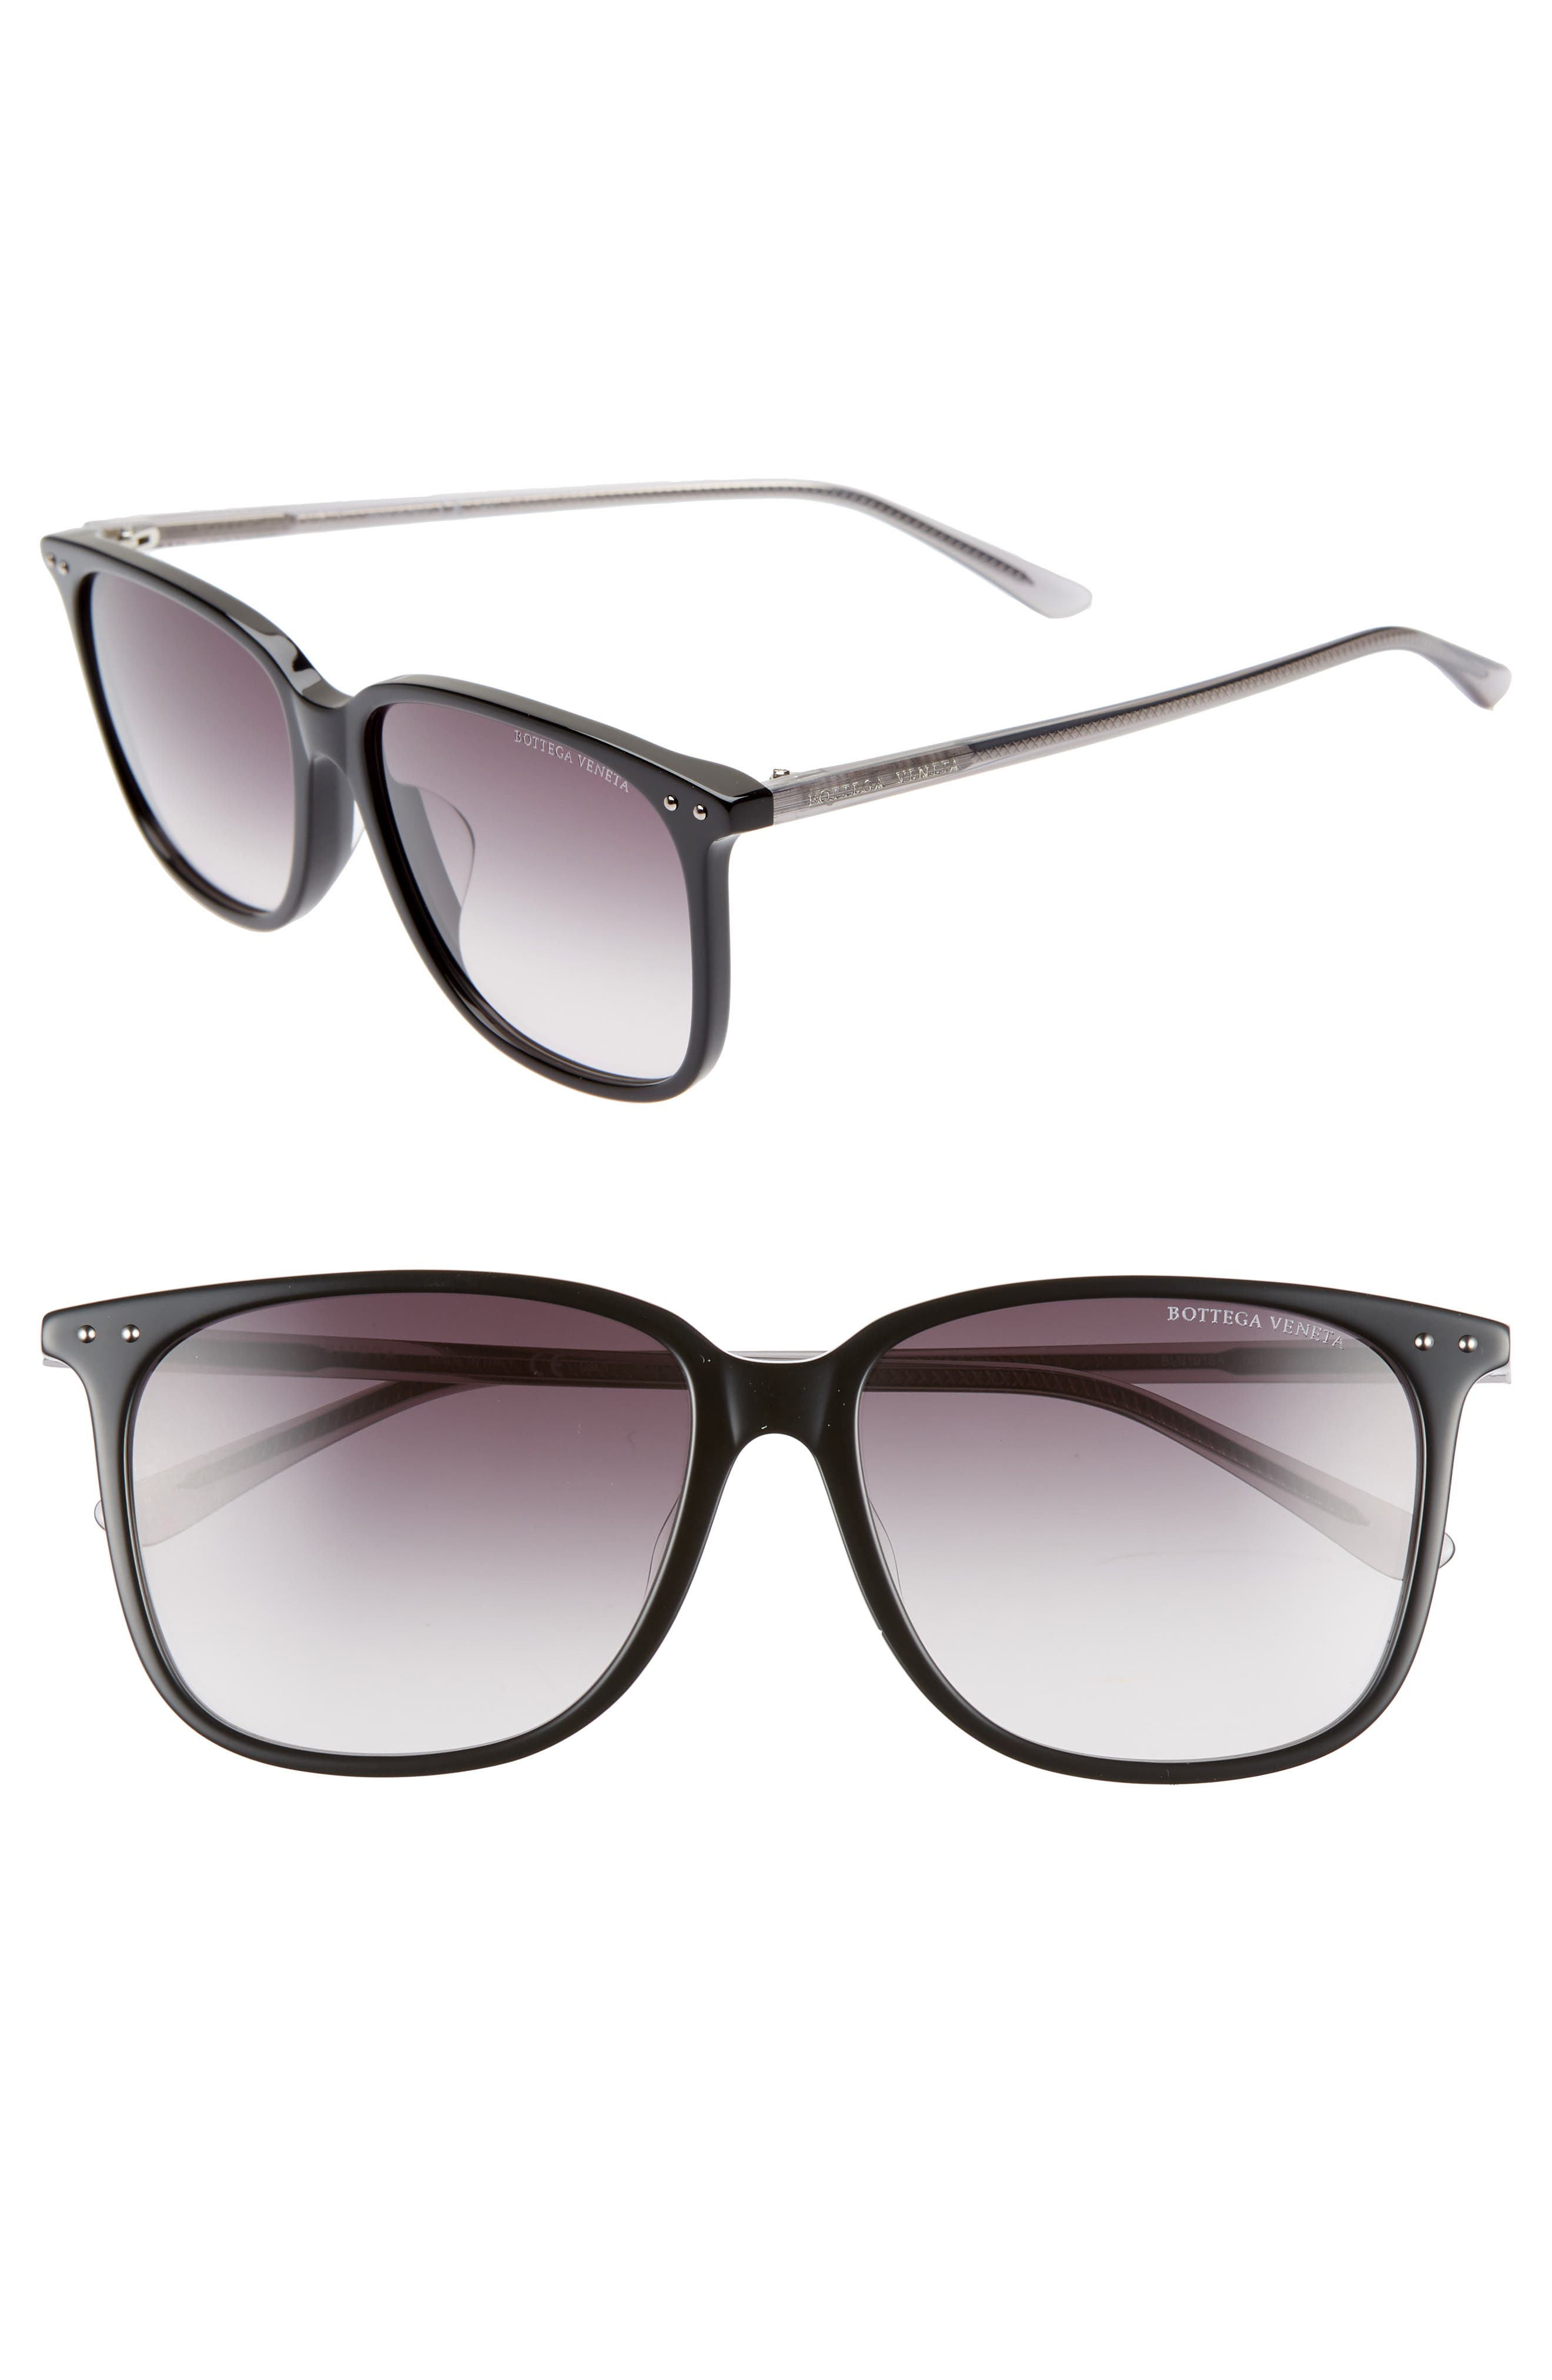 58mm Gradient Square Sunglasses,                             Main thumbnail 1, color,                             BLACK/ GREY